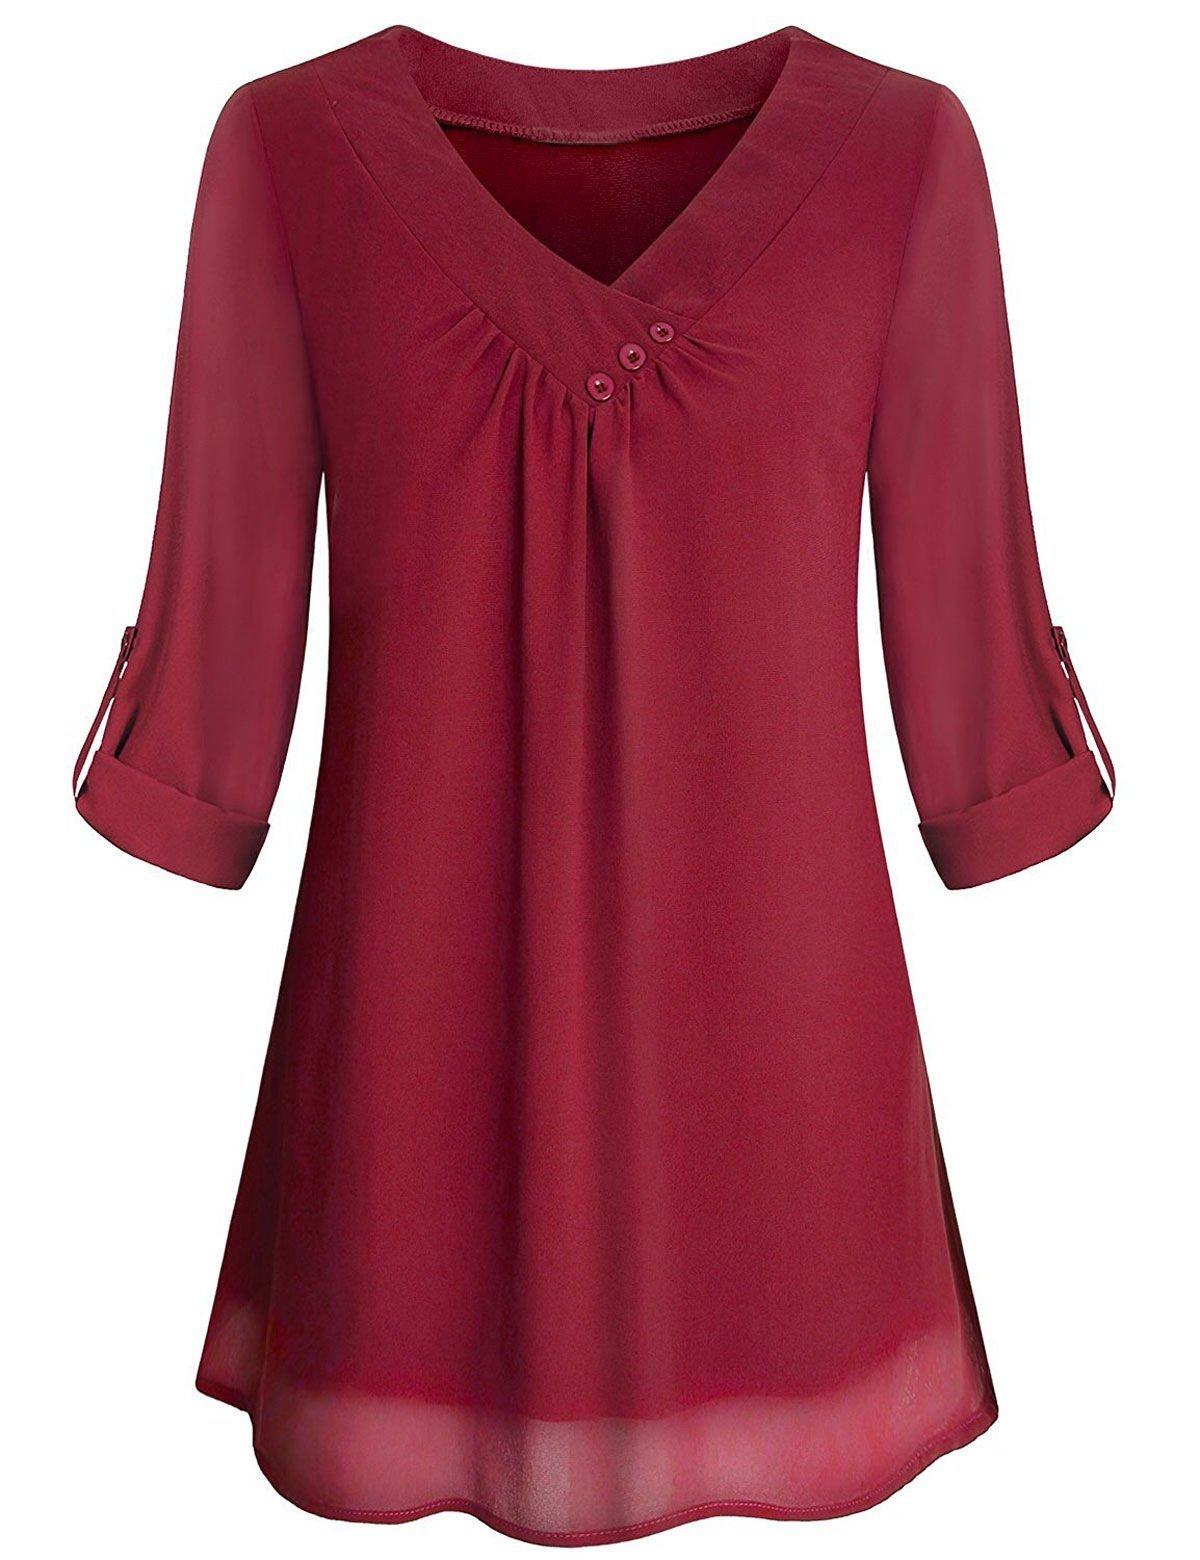 Chiffon Blouse, Women Casual Vneck Cuffed Sleeve Business Wear Work Clothes Pretty Button Collar Airy Flowing Thin Solid Flowy Fashion Shirt Tunics Top